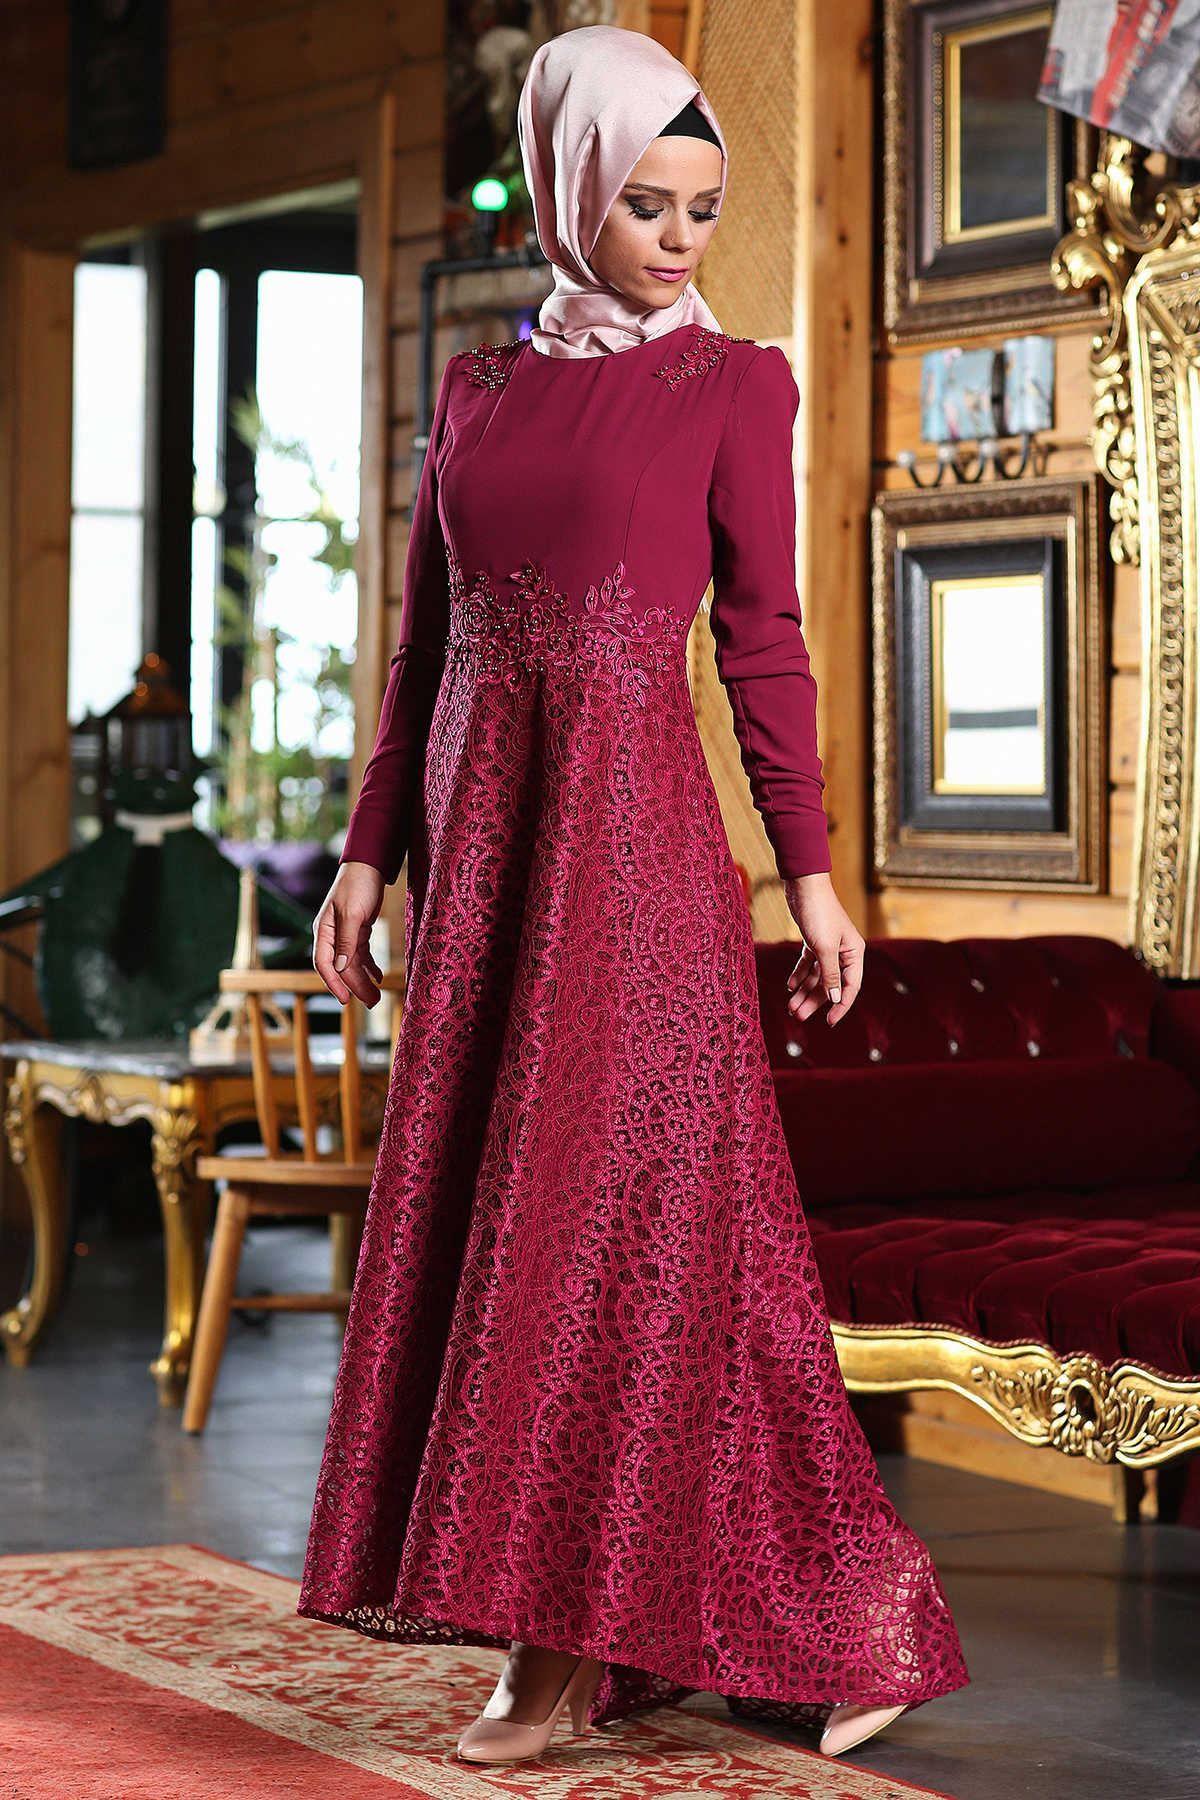 Patirticom Adli Kullanicinin Abiye Modelleri Panosundaki Pin 2020 Elbise Moda Shopping